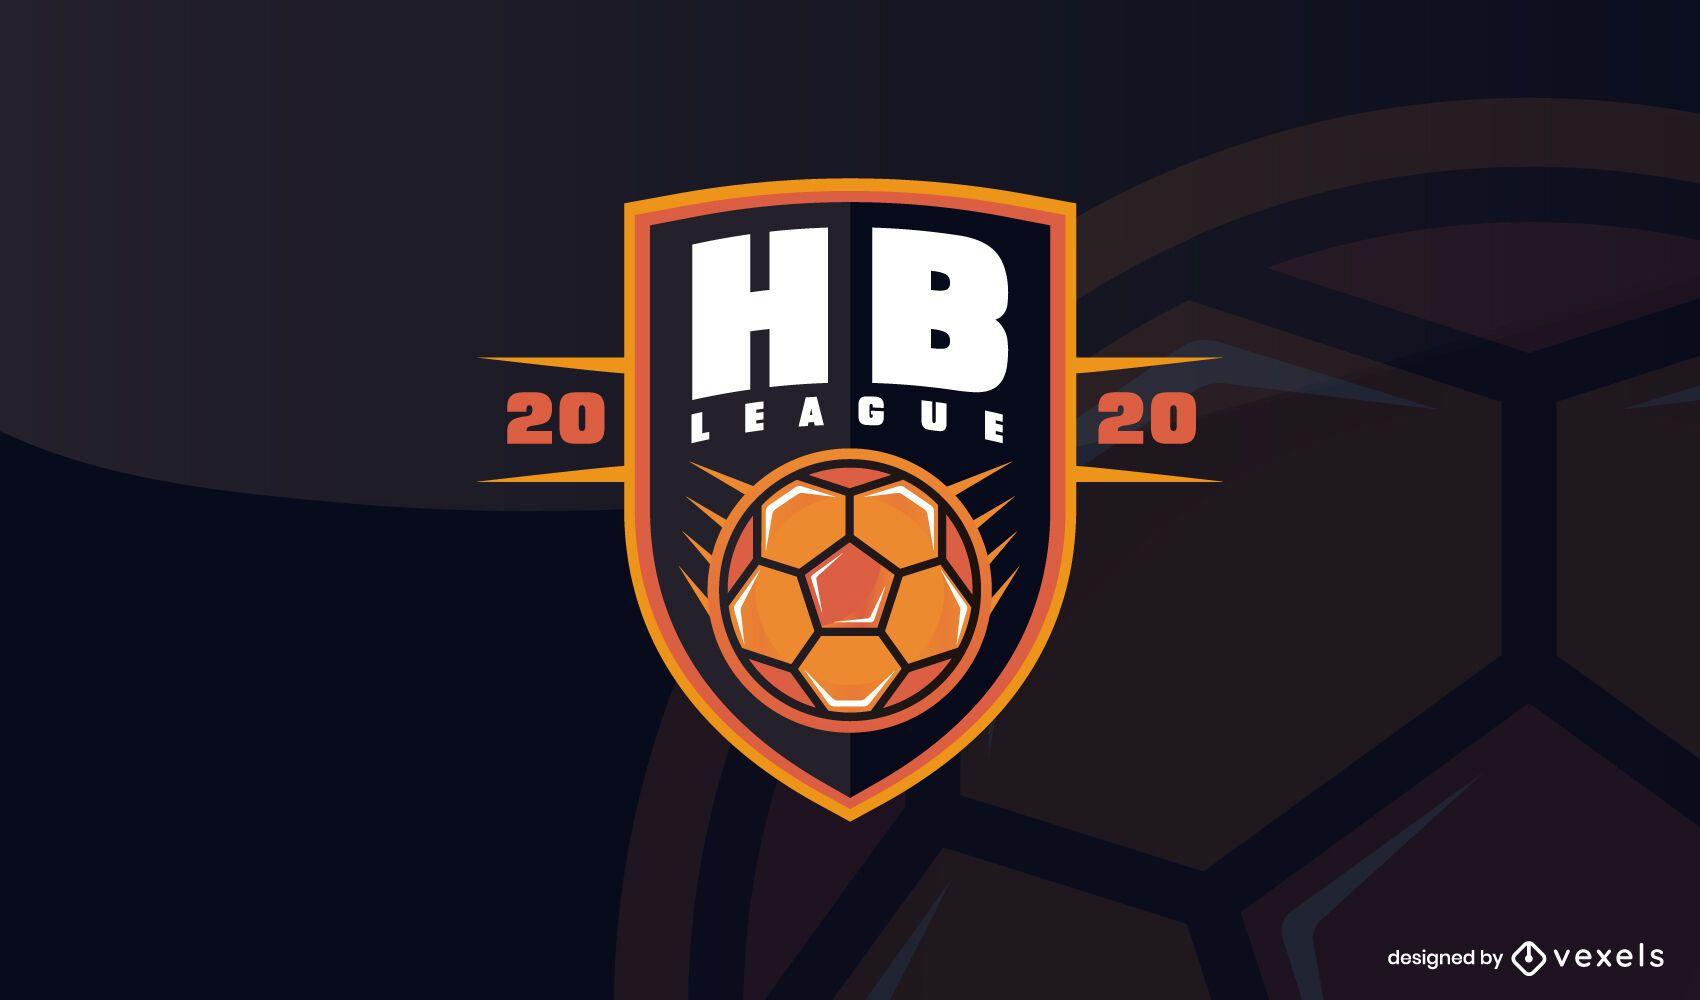 Modelo de design de logotipo da liga de handebol